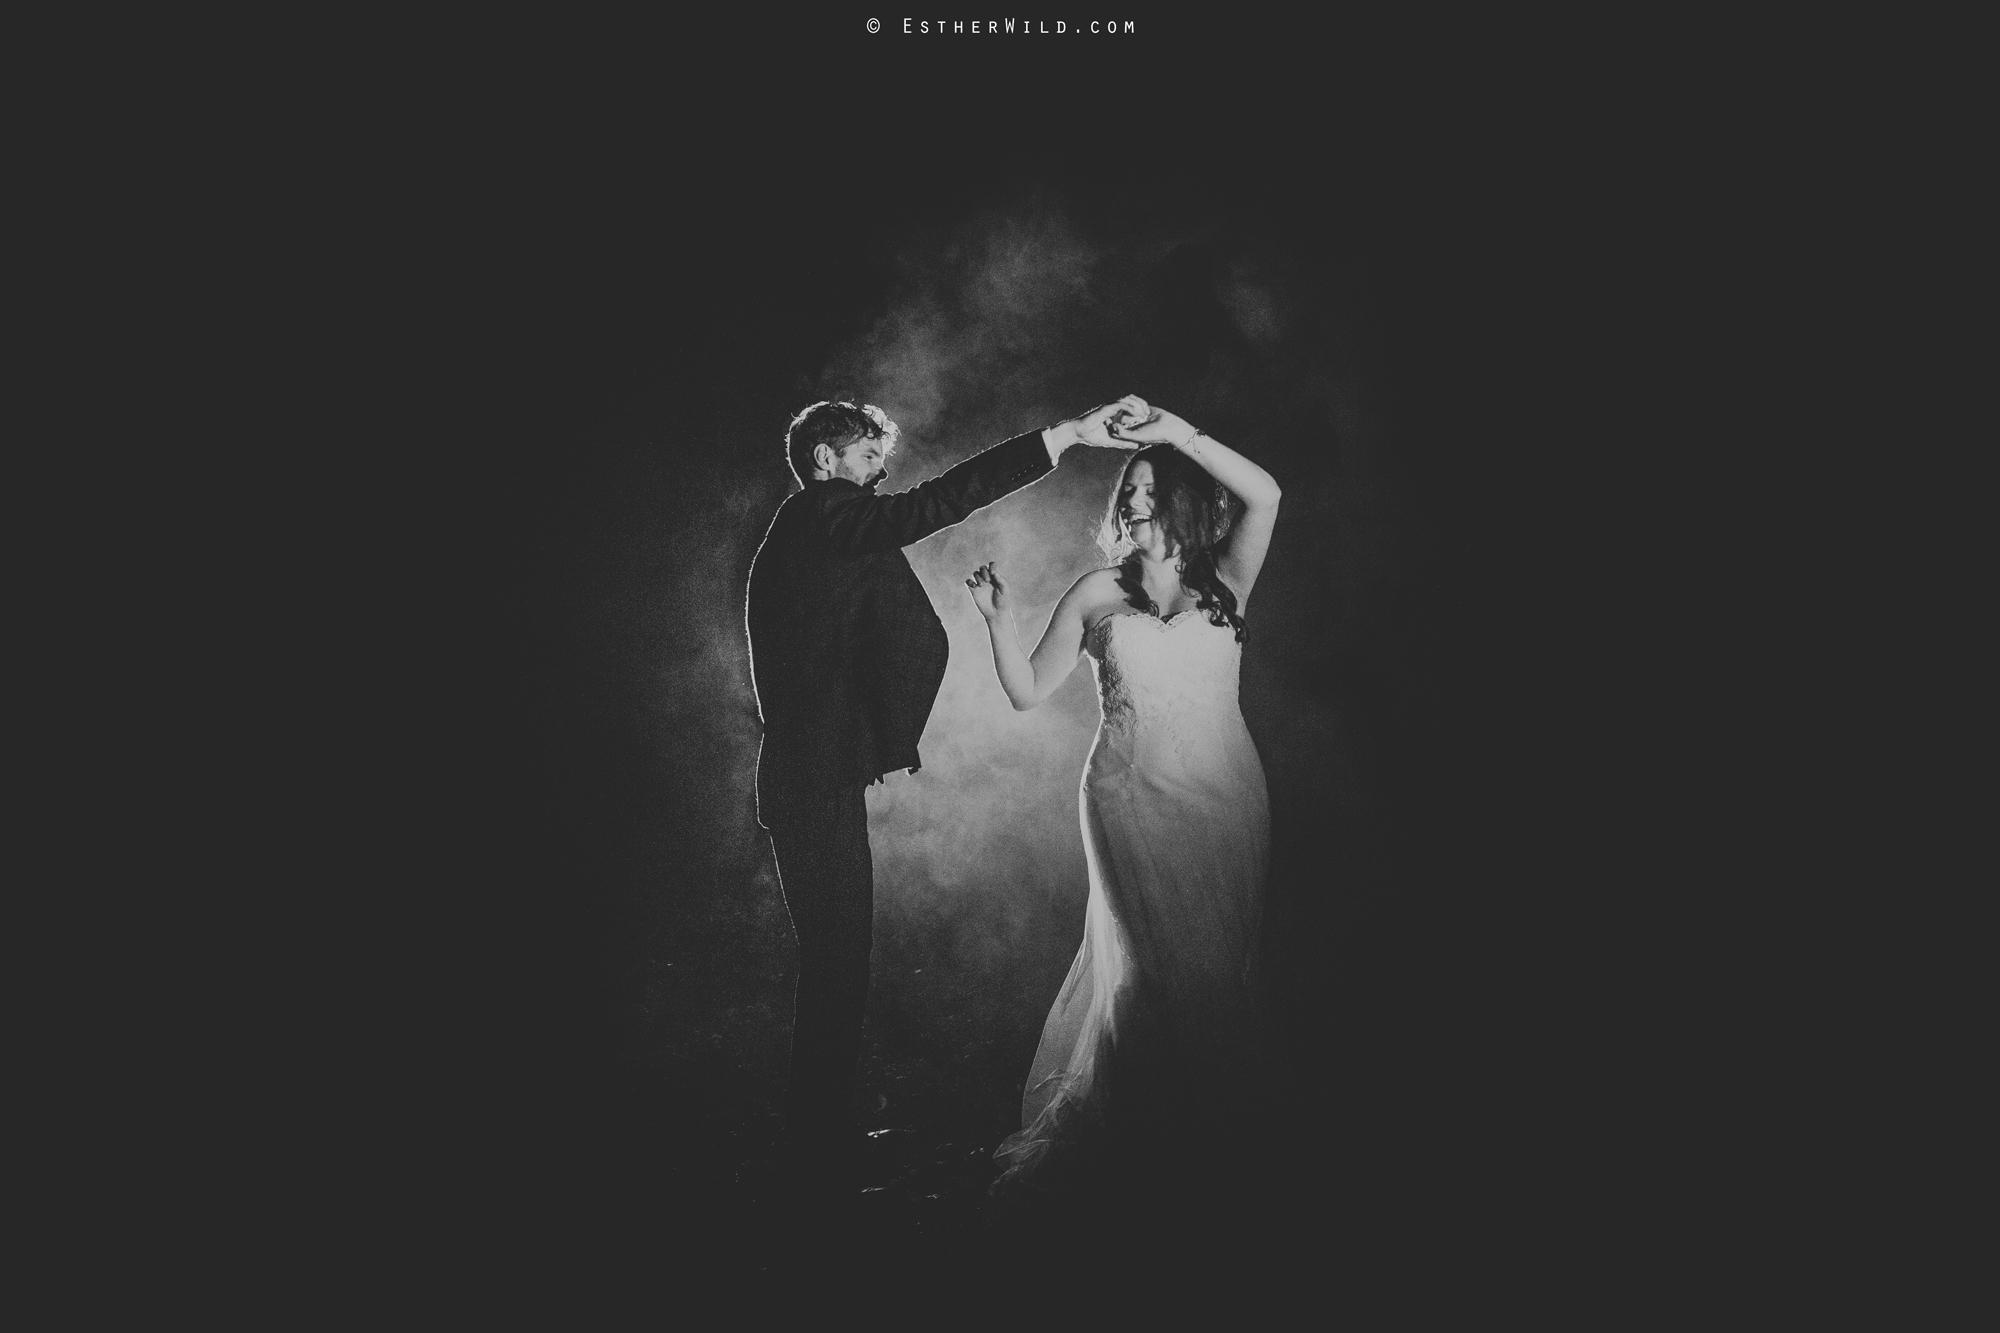 Reading_Room_Weddings_Alby_Norwich_Photographer_Esther_Wild_IMG_3231-2.jpg